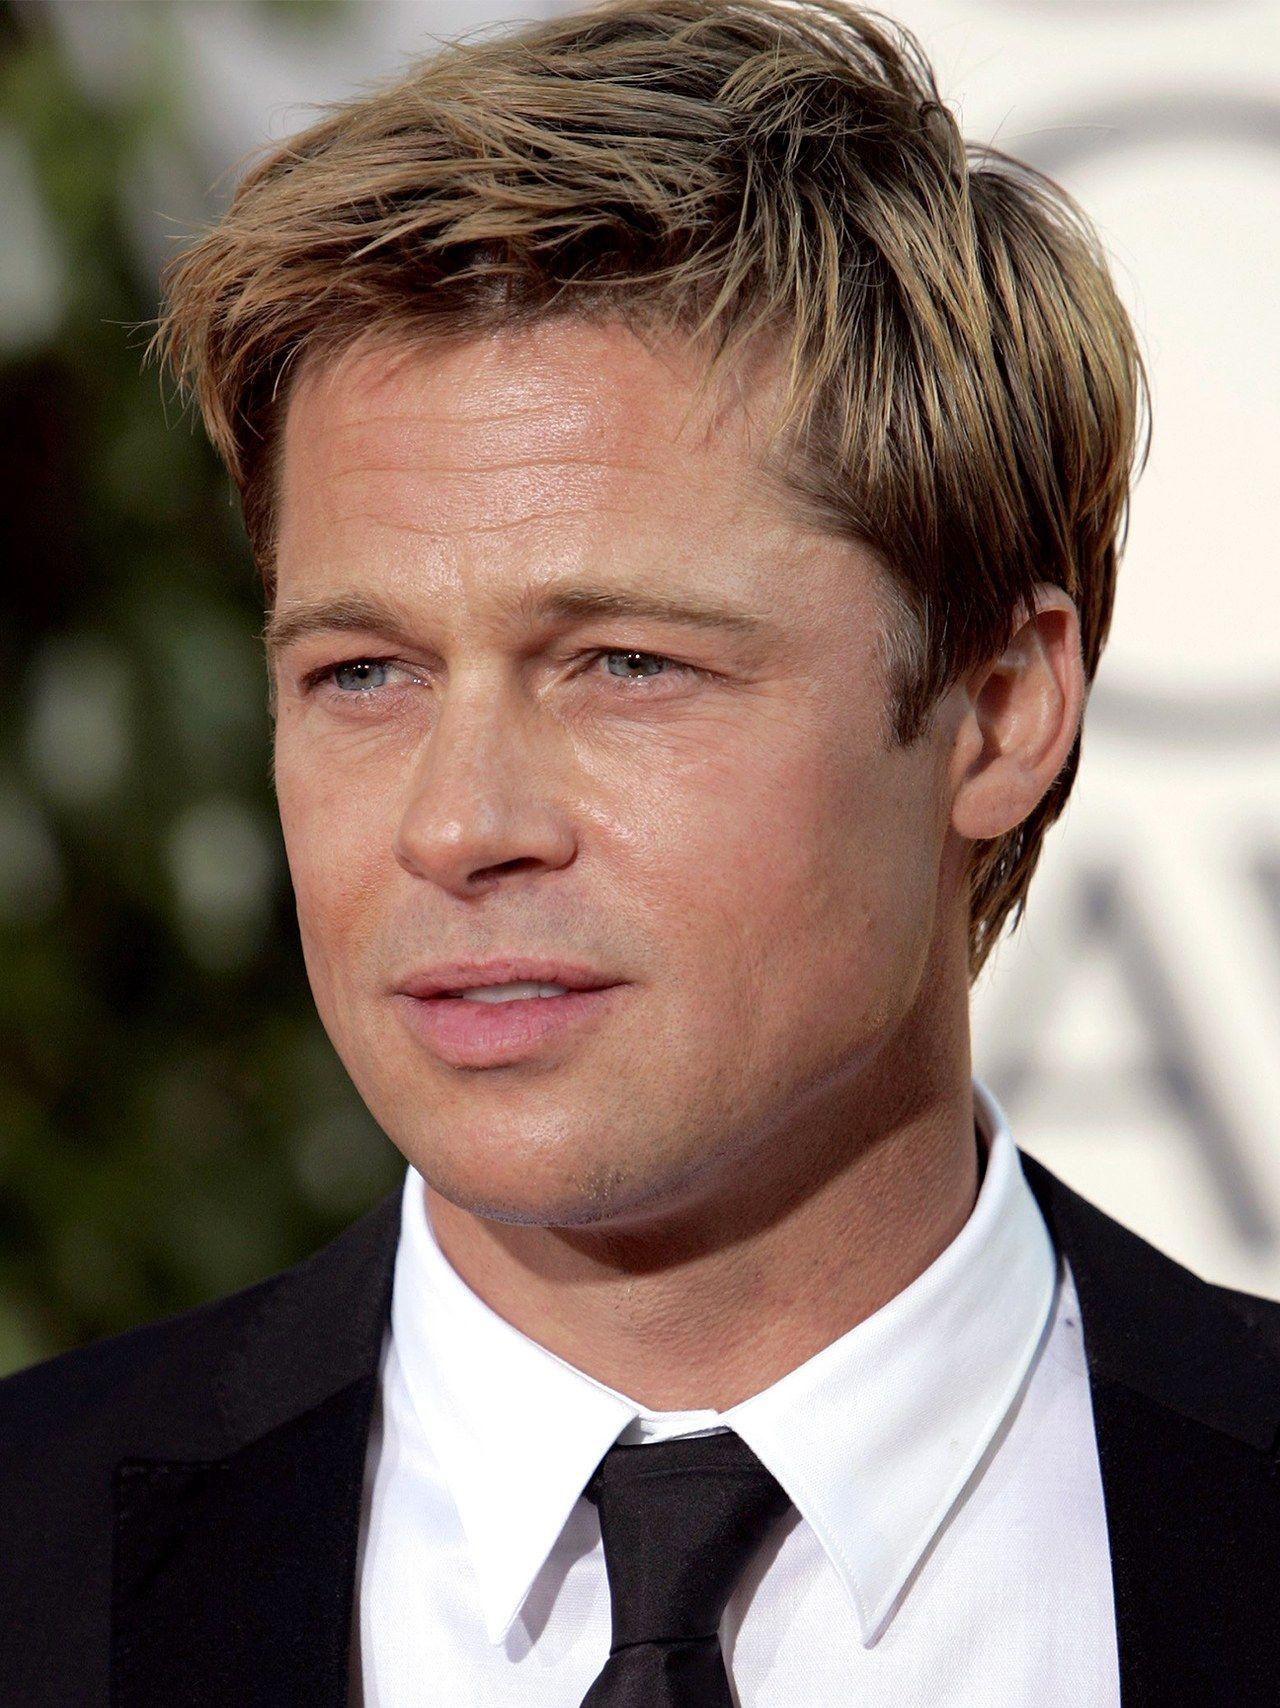 16 Looks That Prove Brad Pitt Is A Grooming God